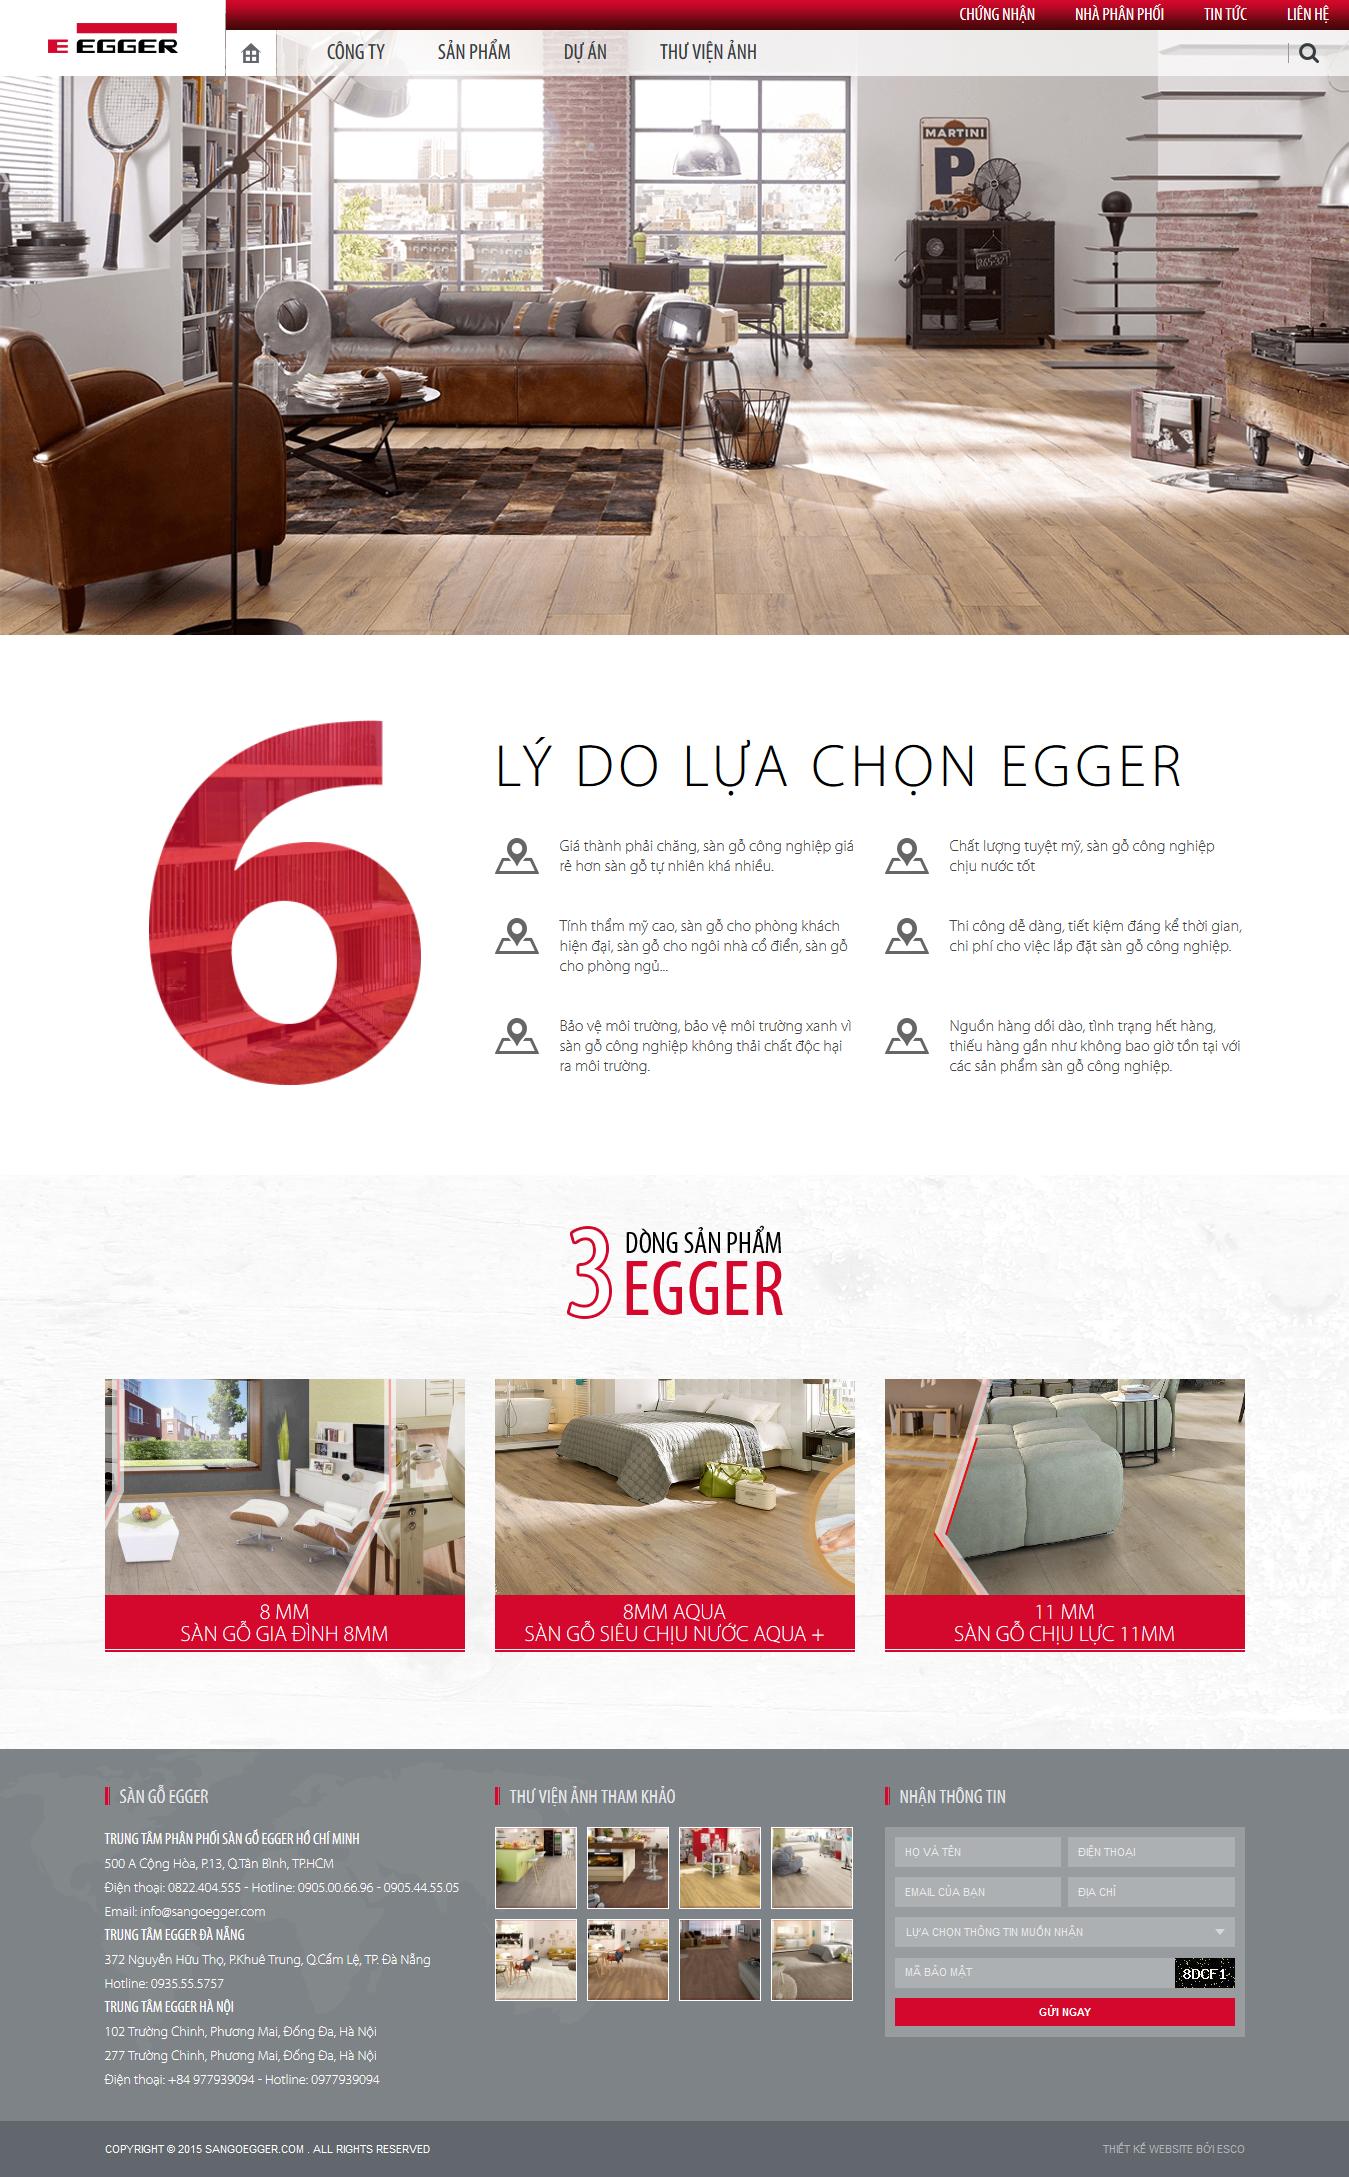 Thiết kế website sàn gỗ Sangoegger.com